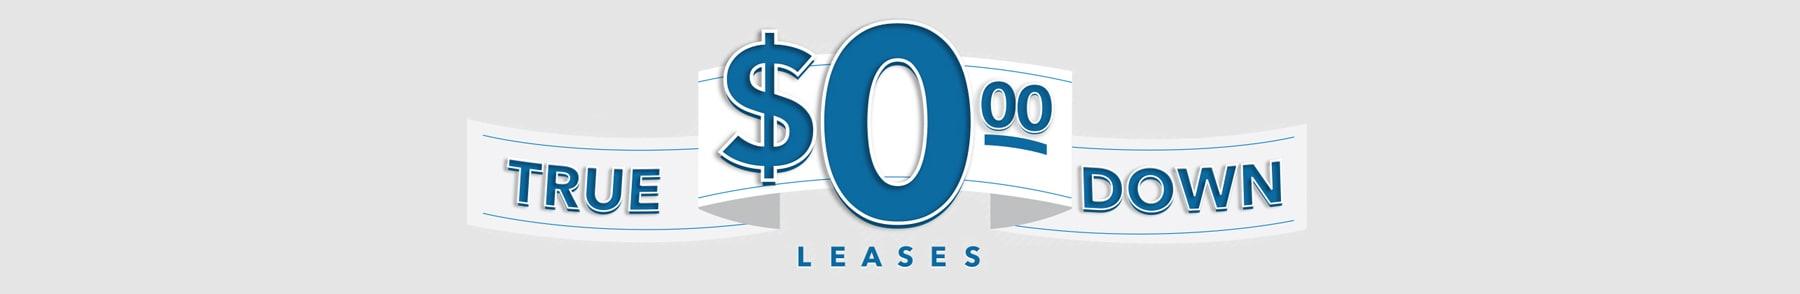 No Money Down Lease Deals >> Honda 0 Down Lease Deals Get Your Dream Car For 0 Down